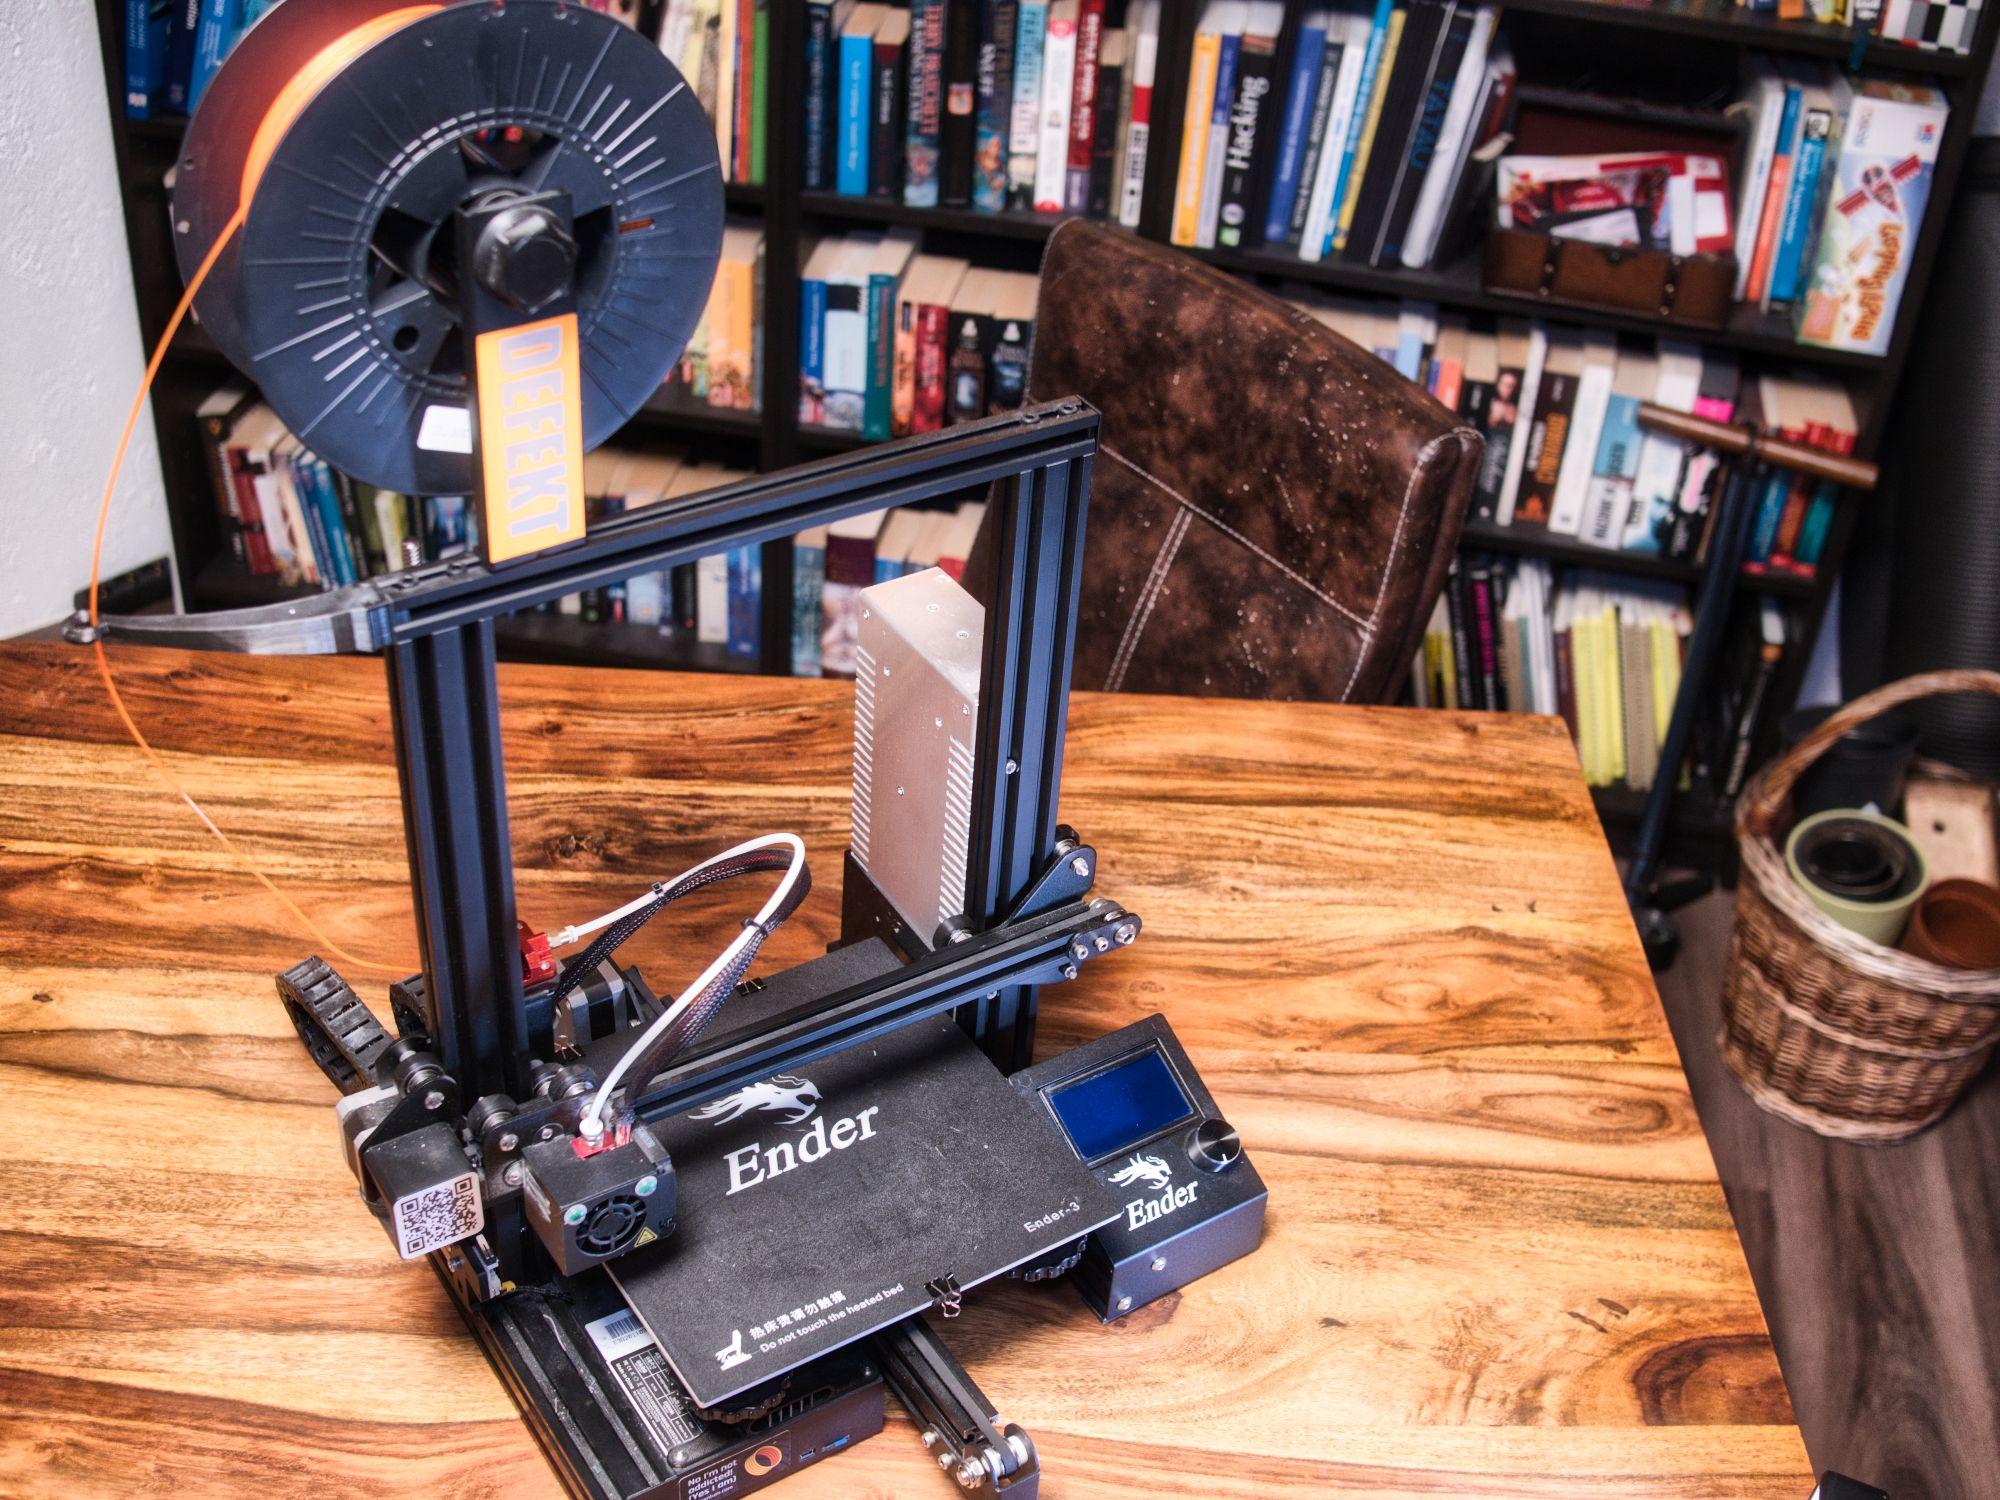 An Ender-3  3d printer